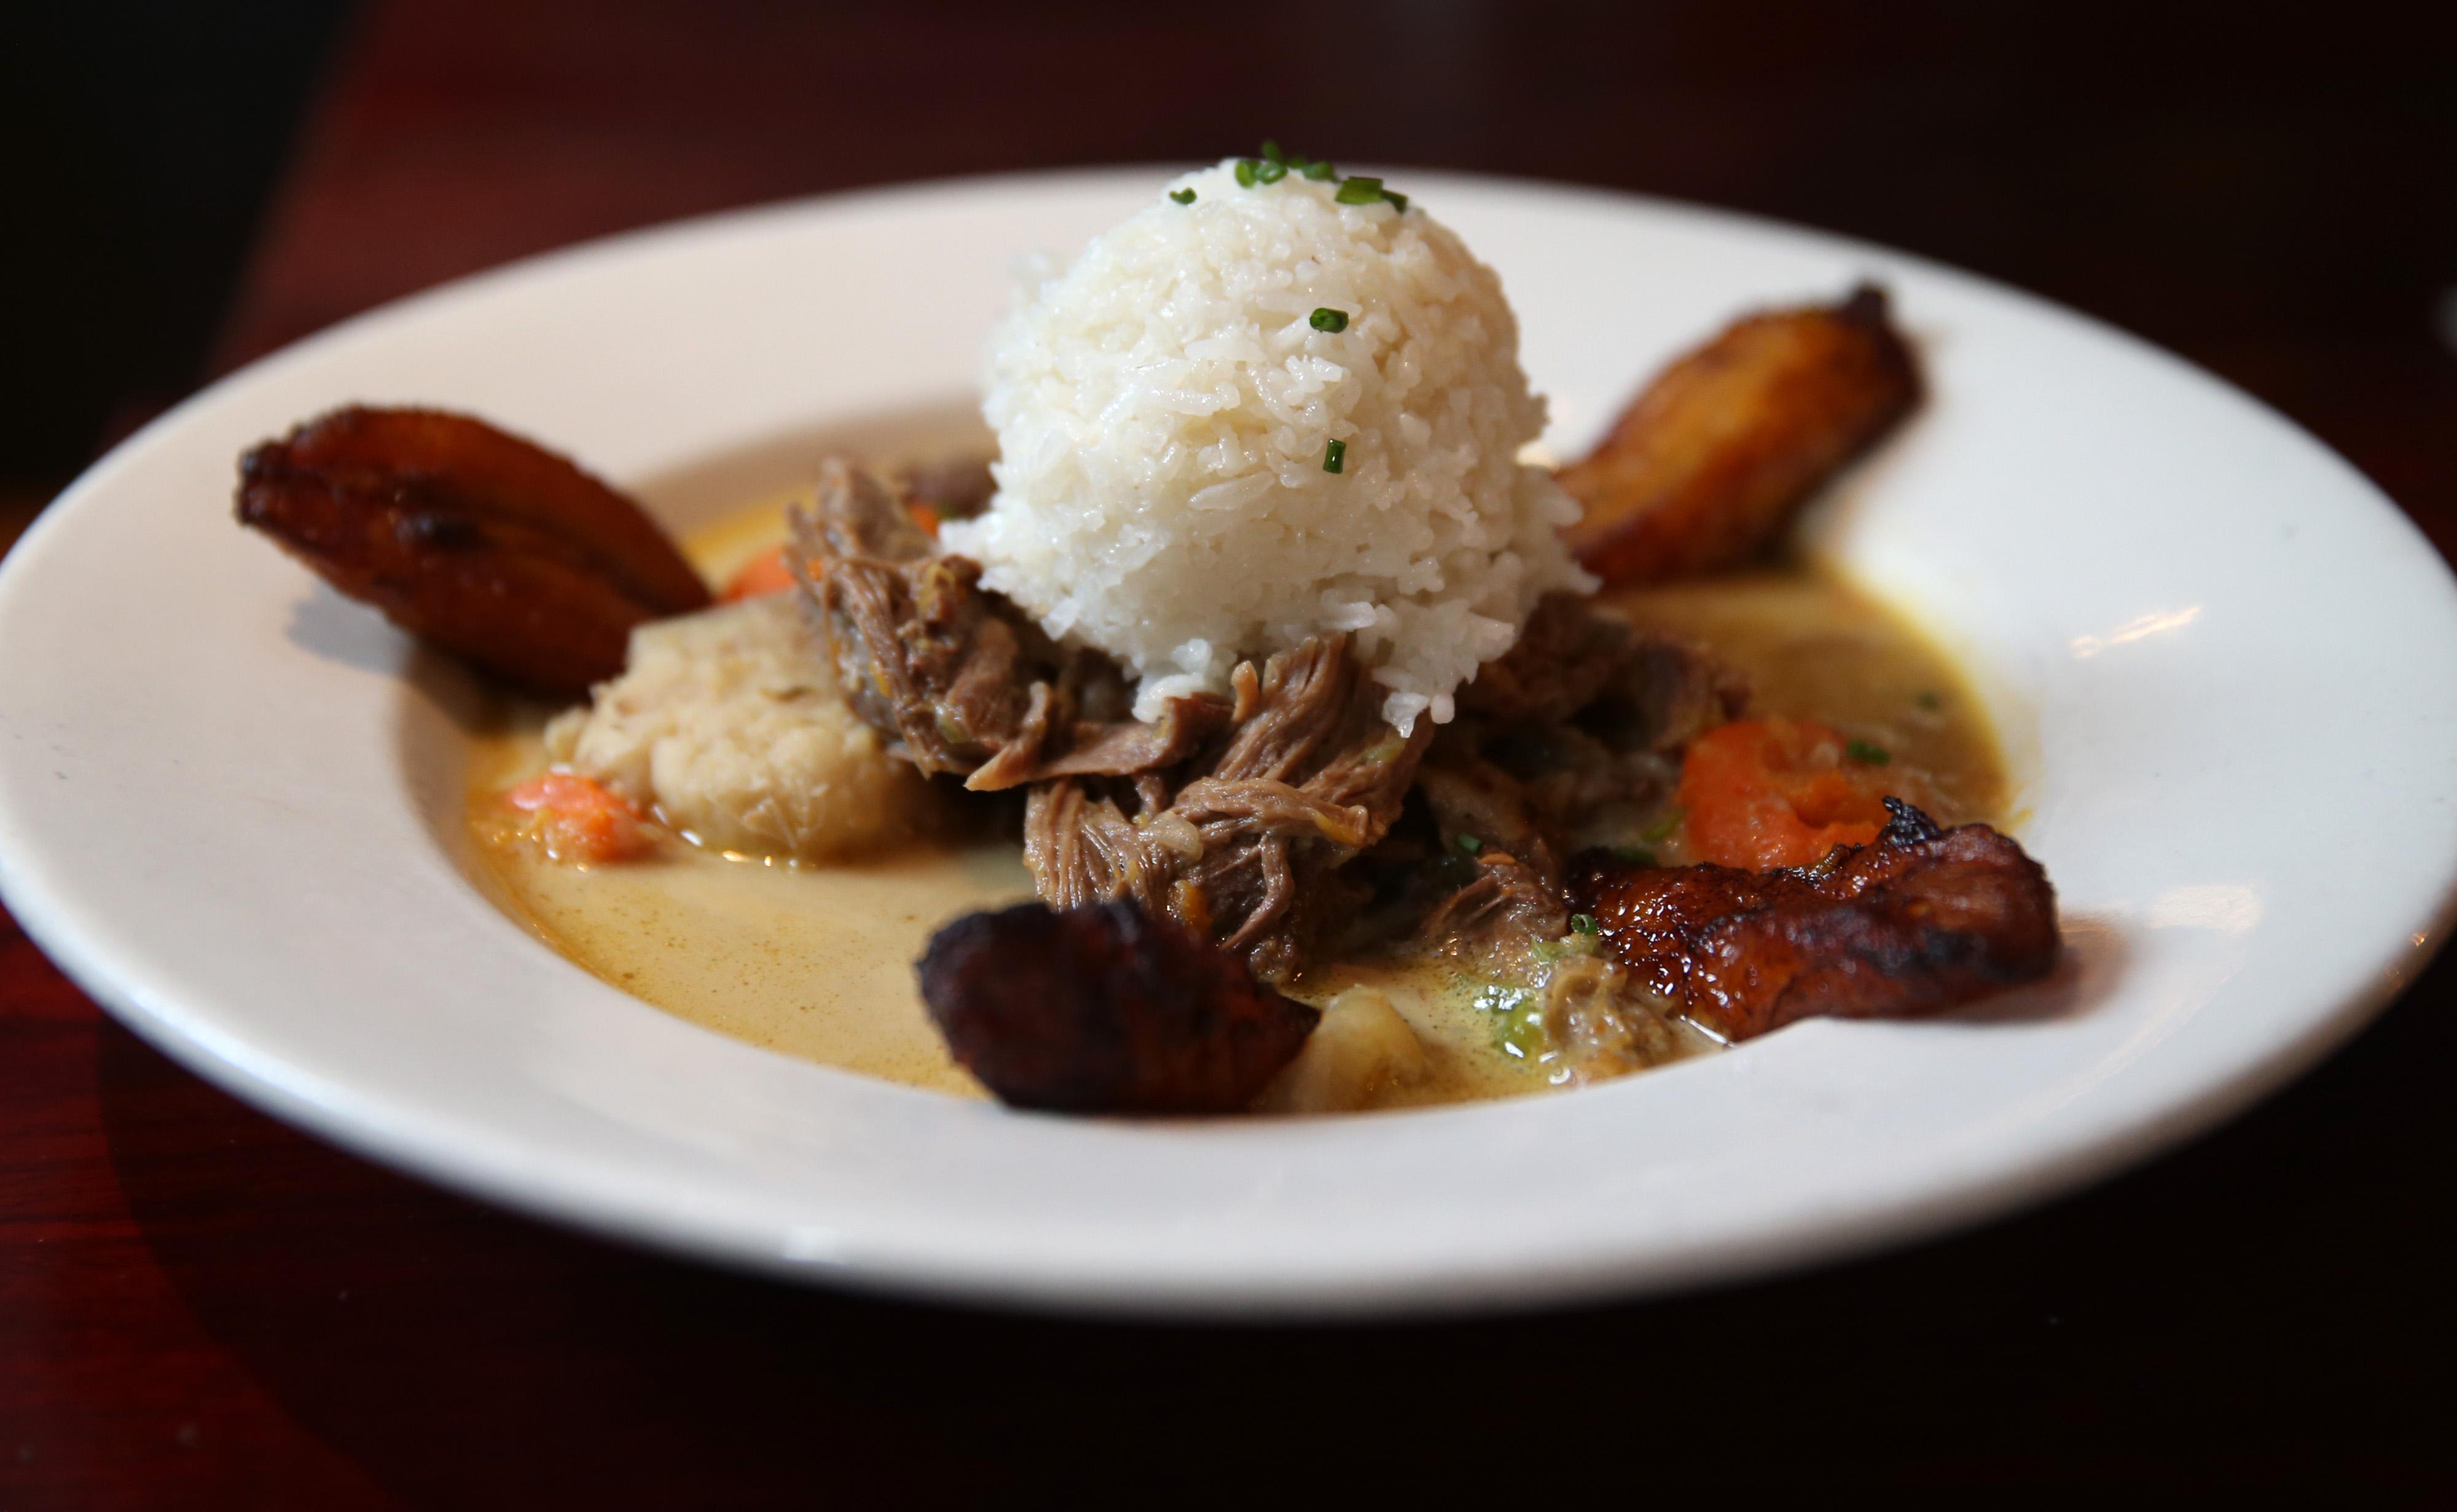 The goat stew at Highland Kitchen.